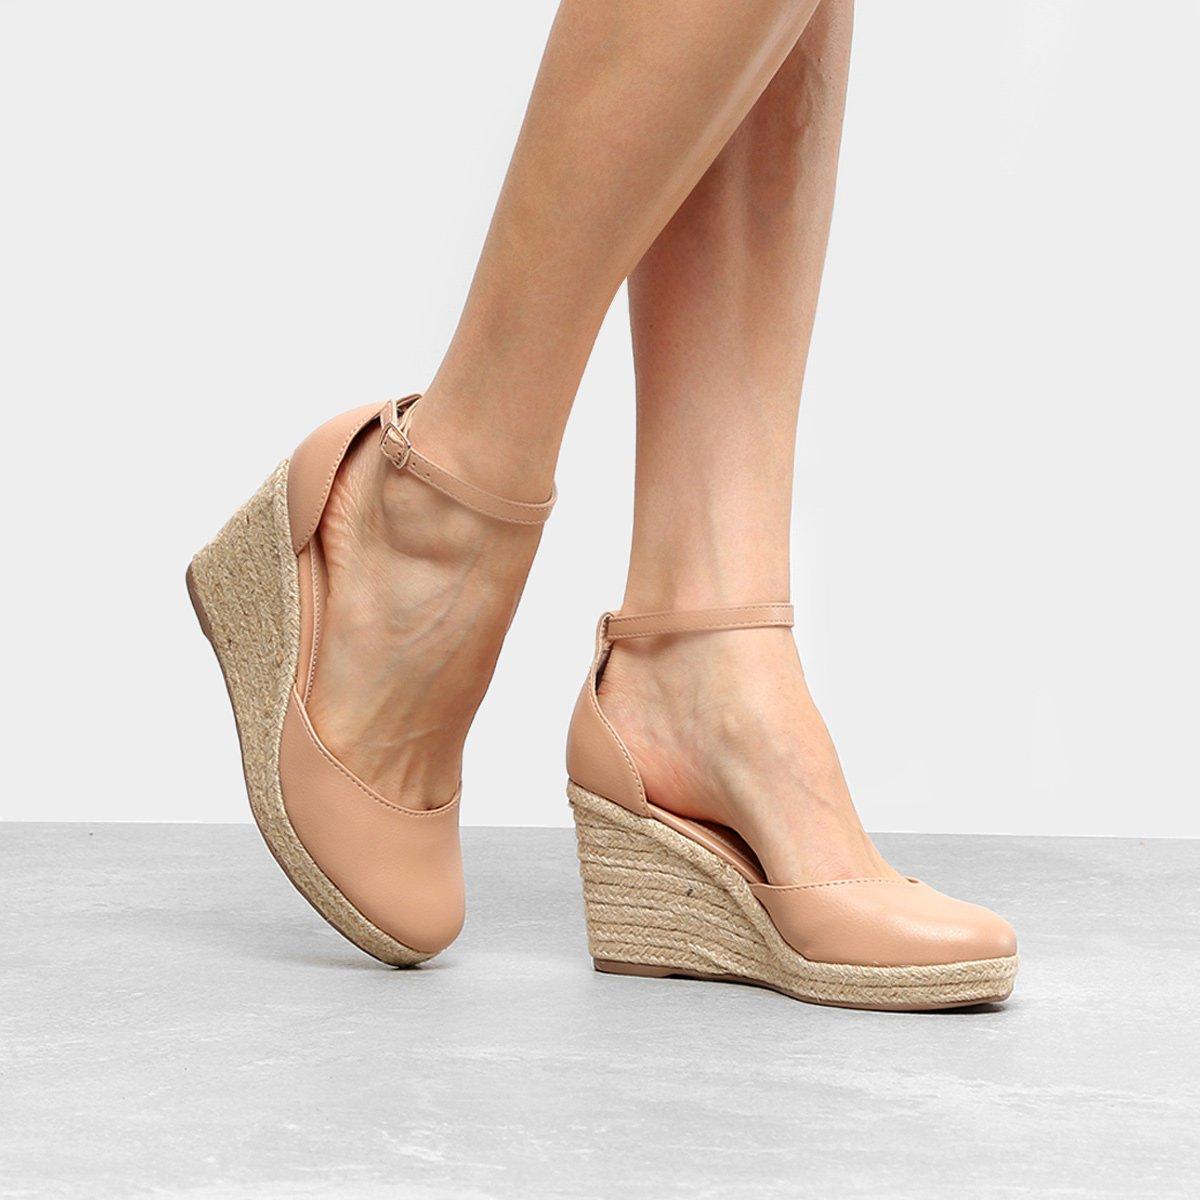 8f2901688 Espadrille Anabela Shoestock Plataforma Fechada Feminina | Shoestock